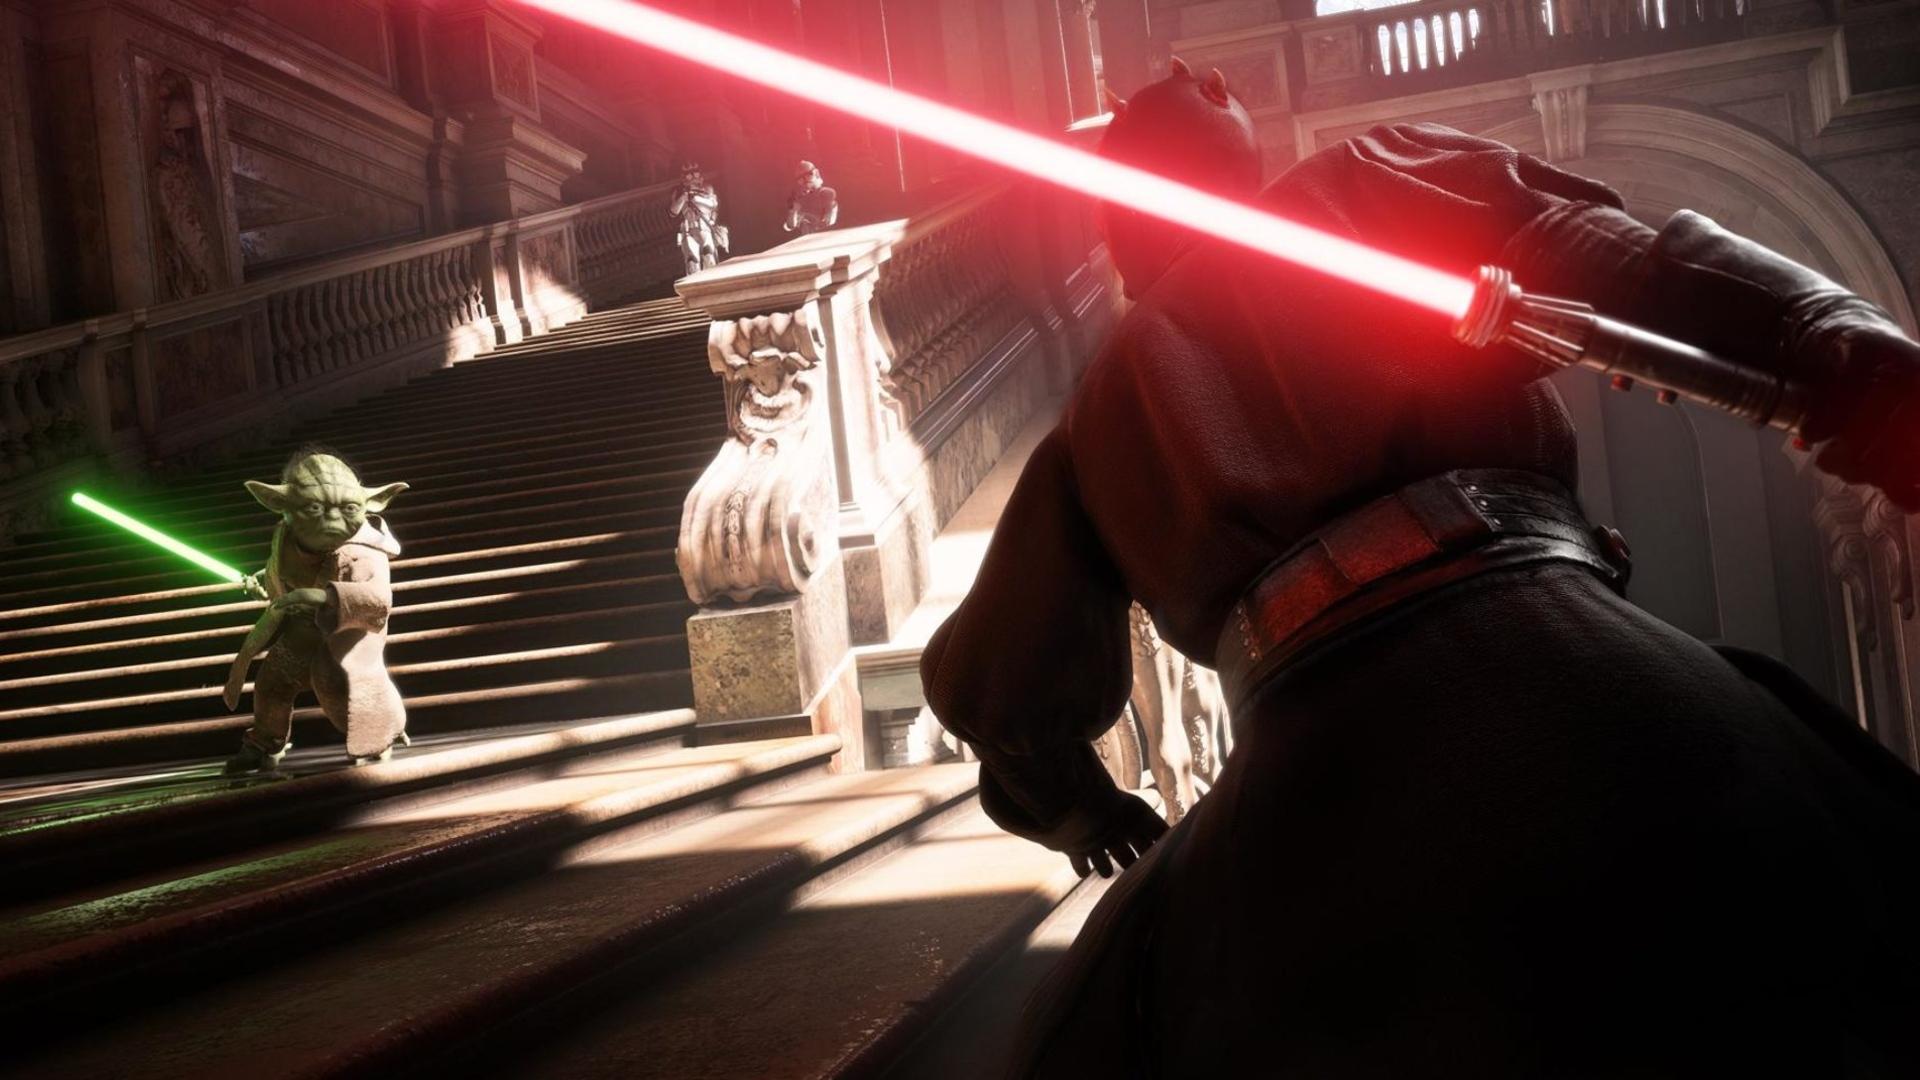 Star Wars action